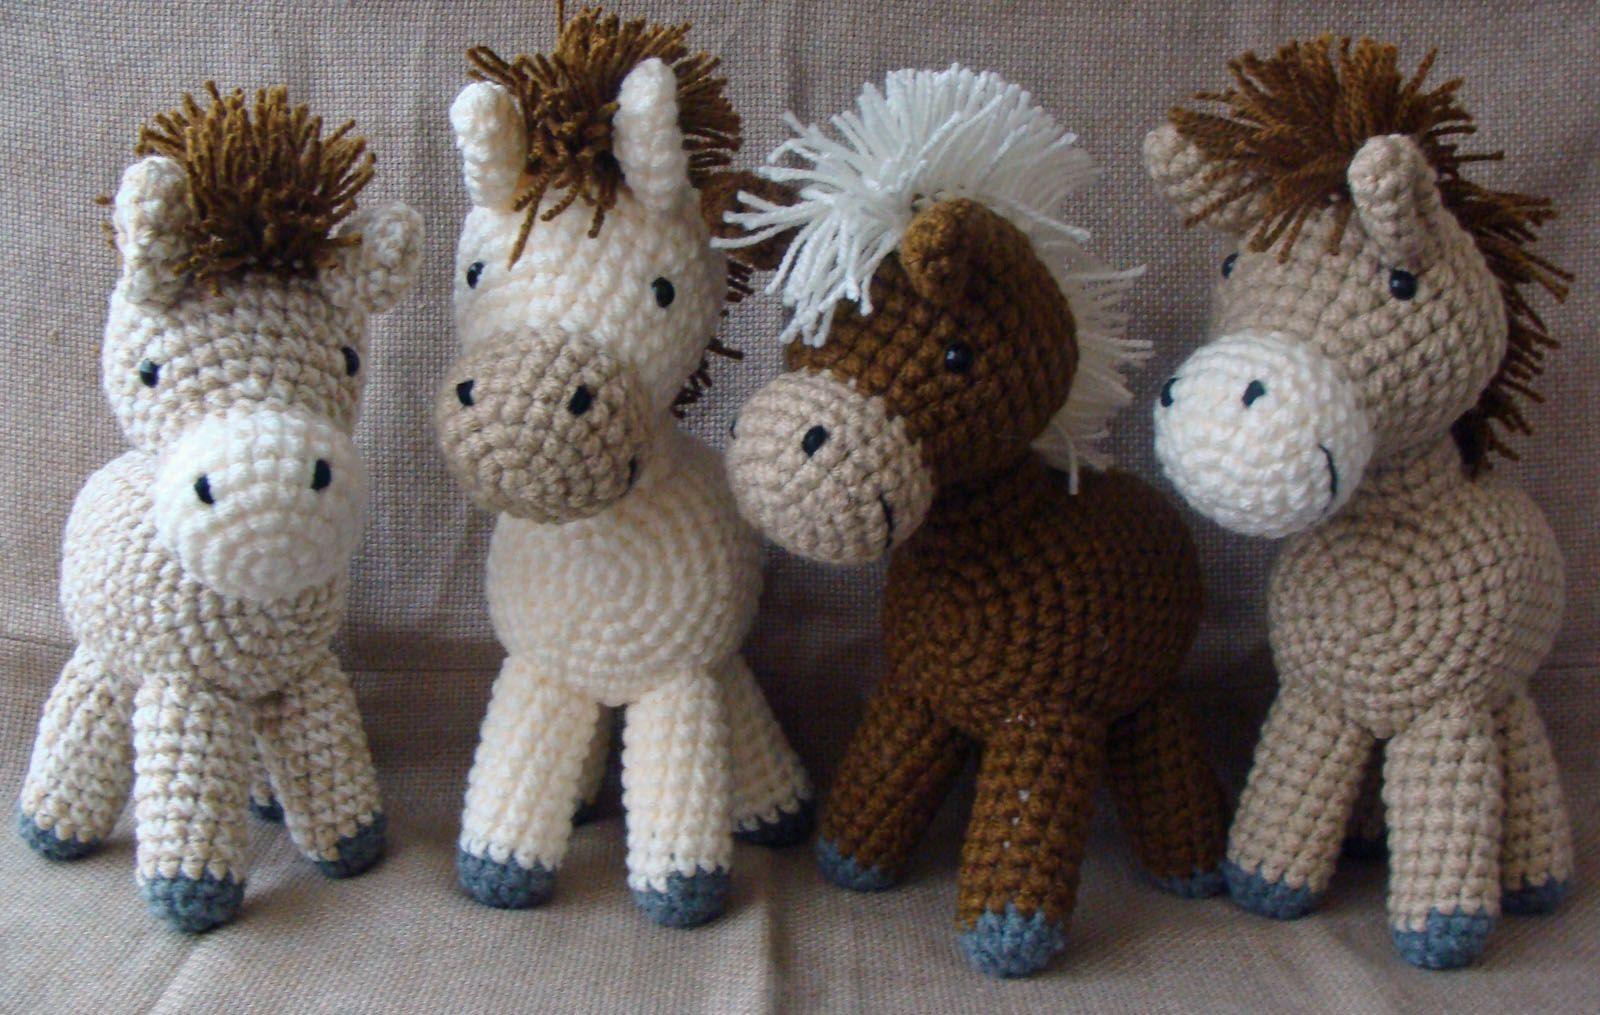 Amigurumis Caballitos A Crochet : Caballitos amigurumi amigurumis amigurumi and crochet